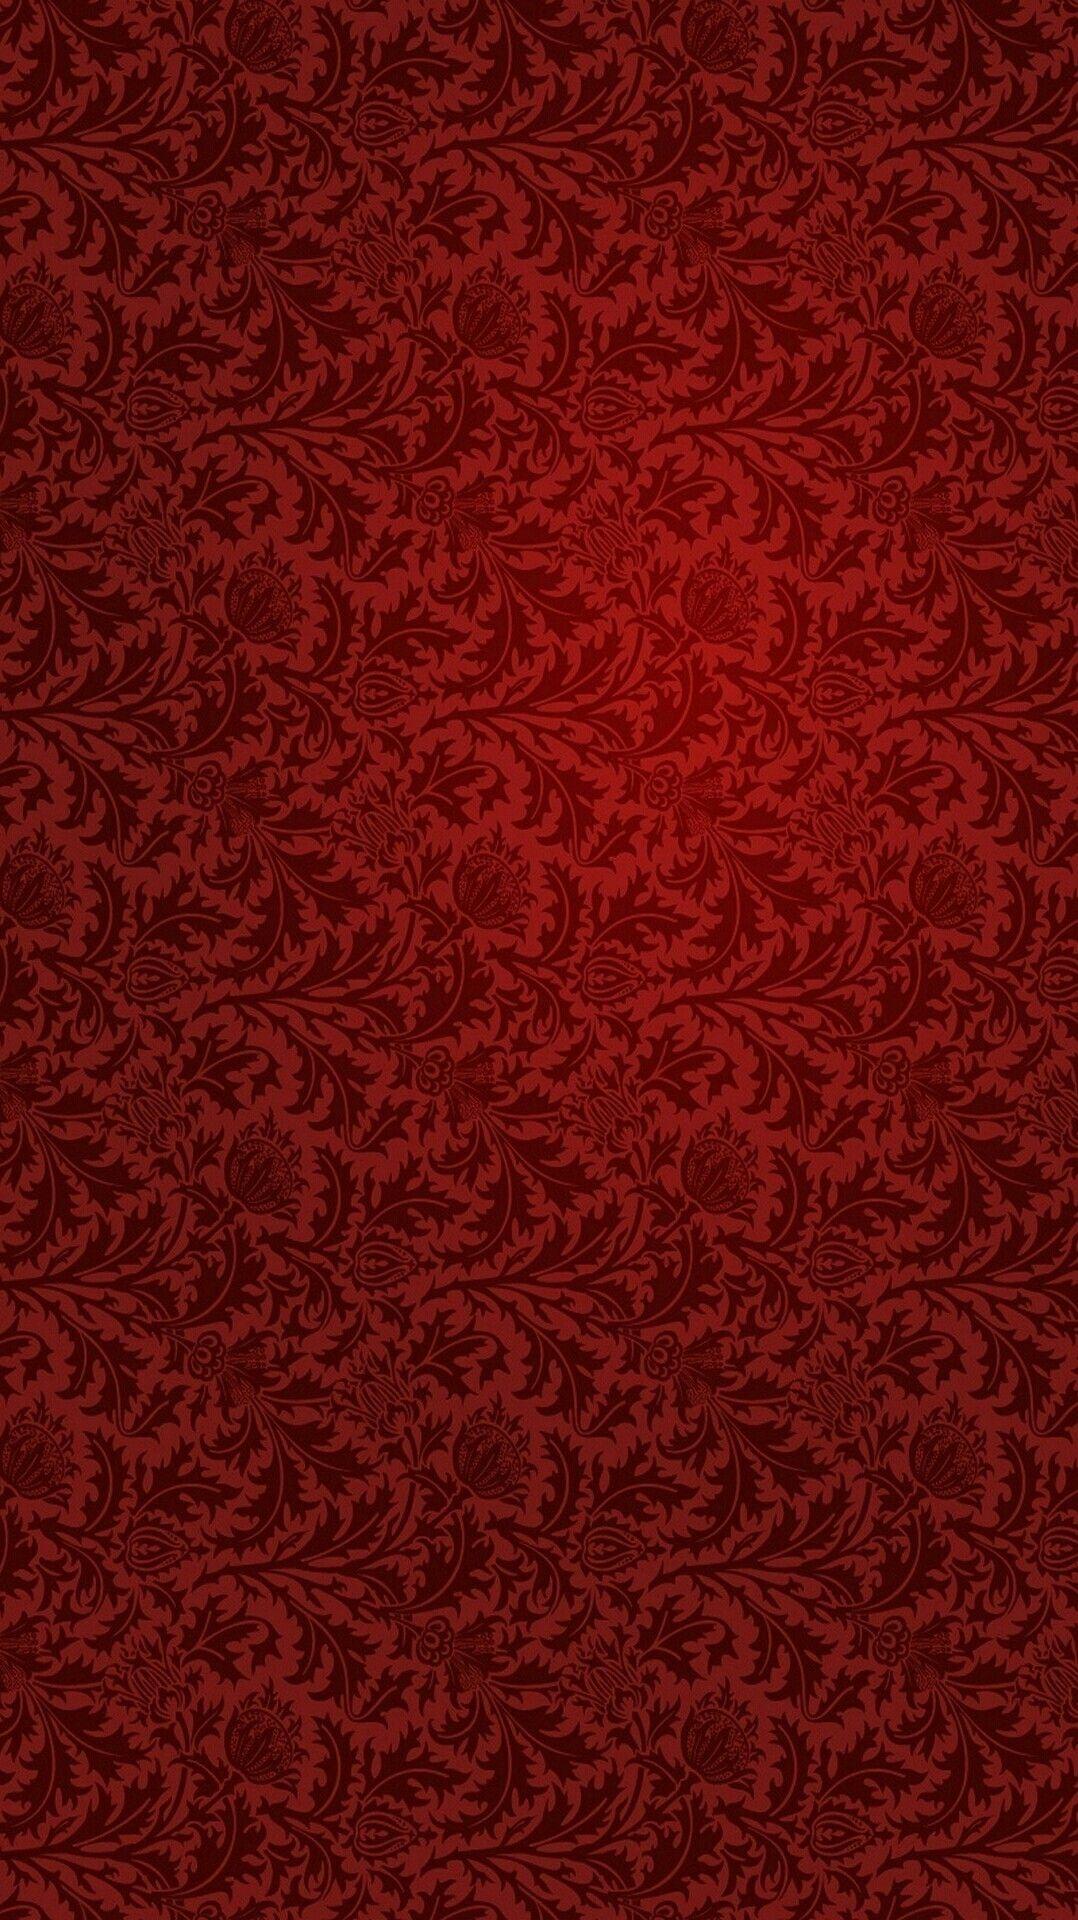 Wallpaper Iphone Wallpaper Pattern Red Wallpaper Pattern Wallpaper